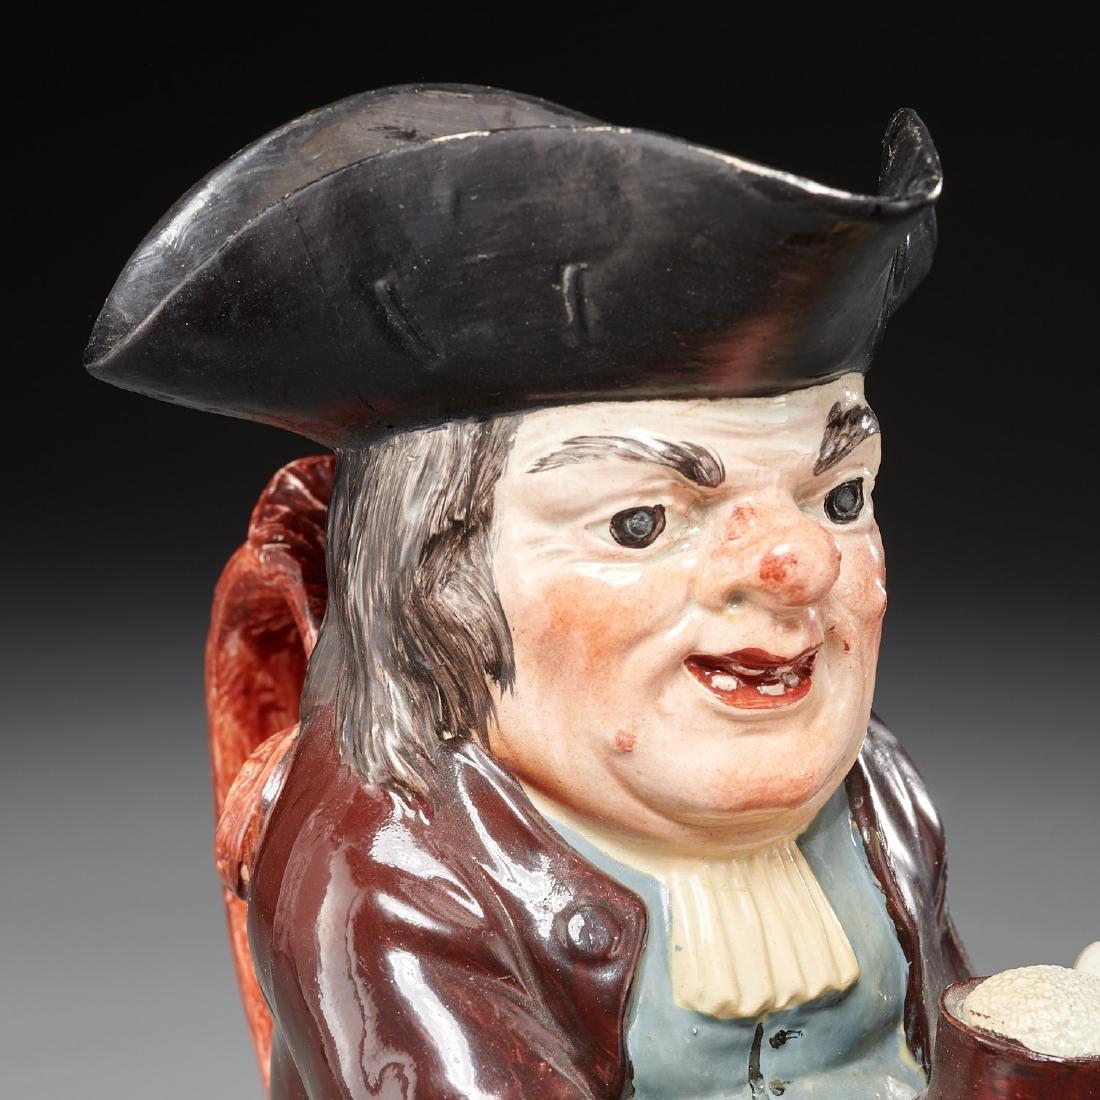 English pearlware Toby jug c. 1800s - 2